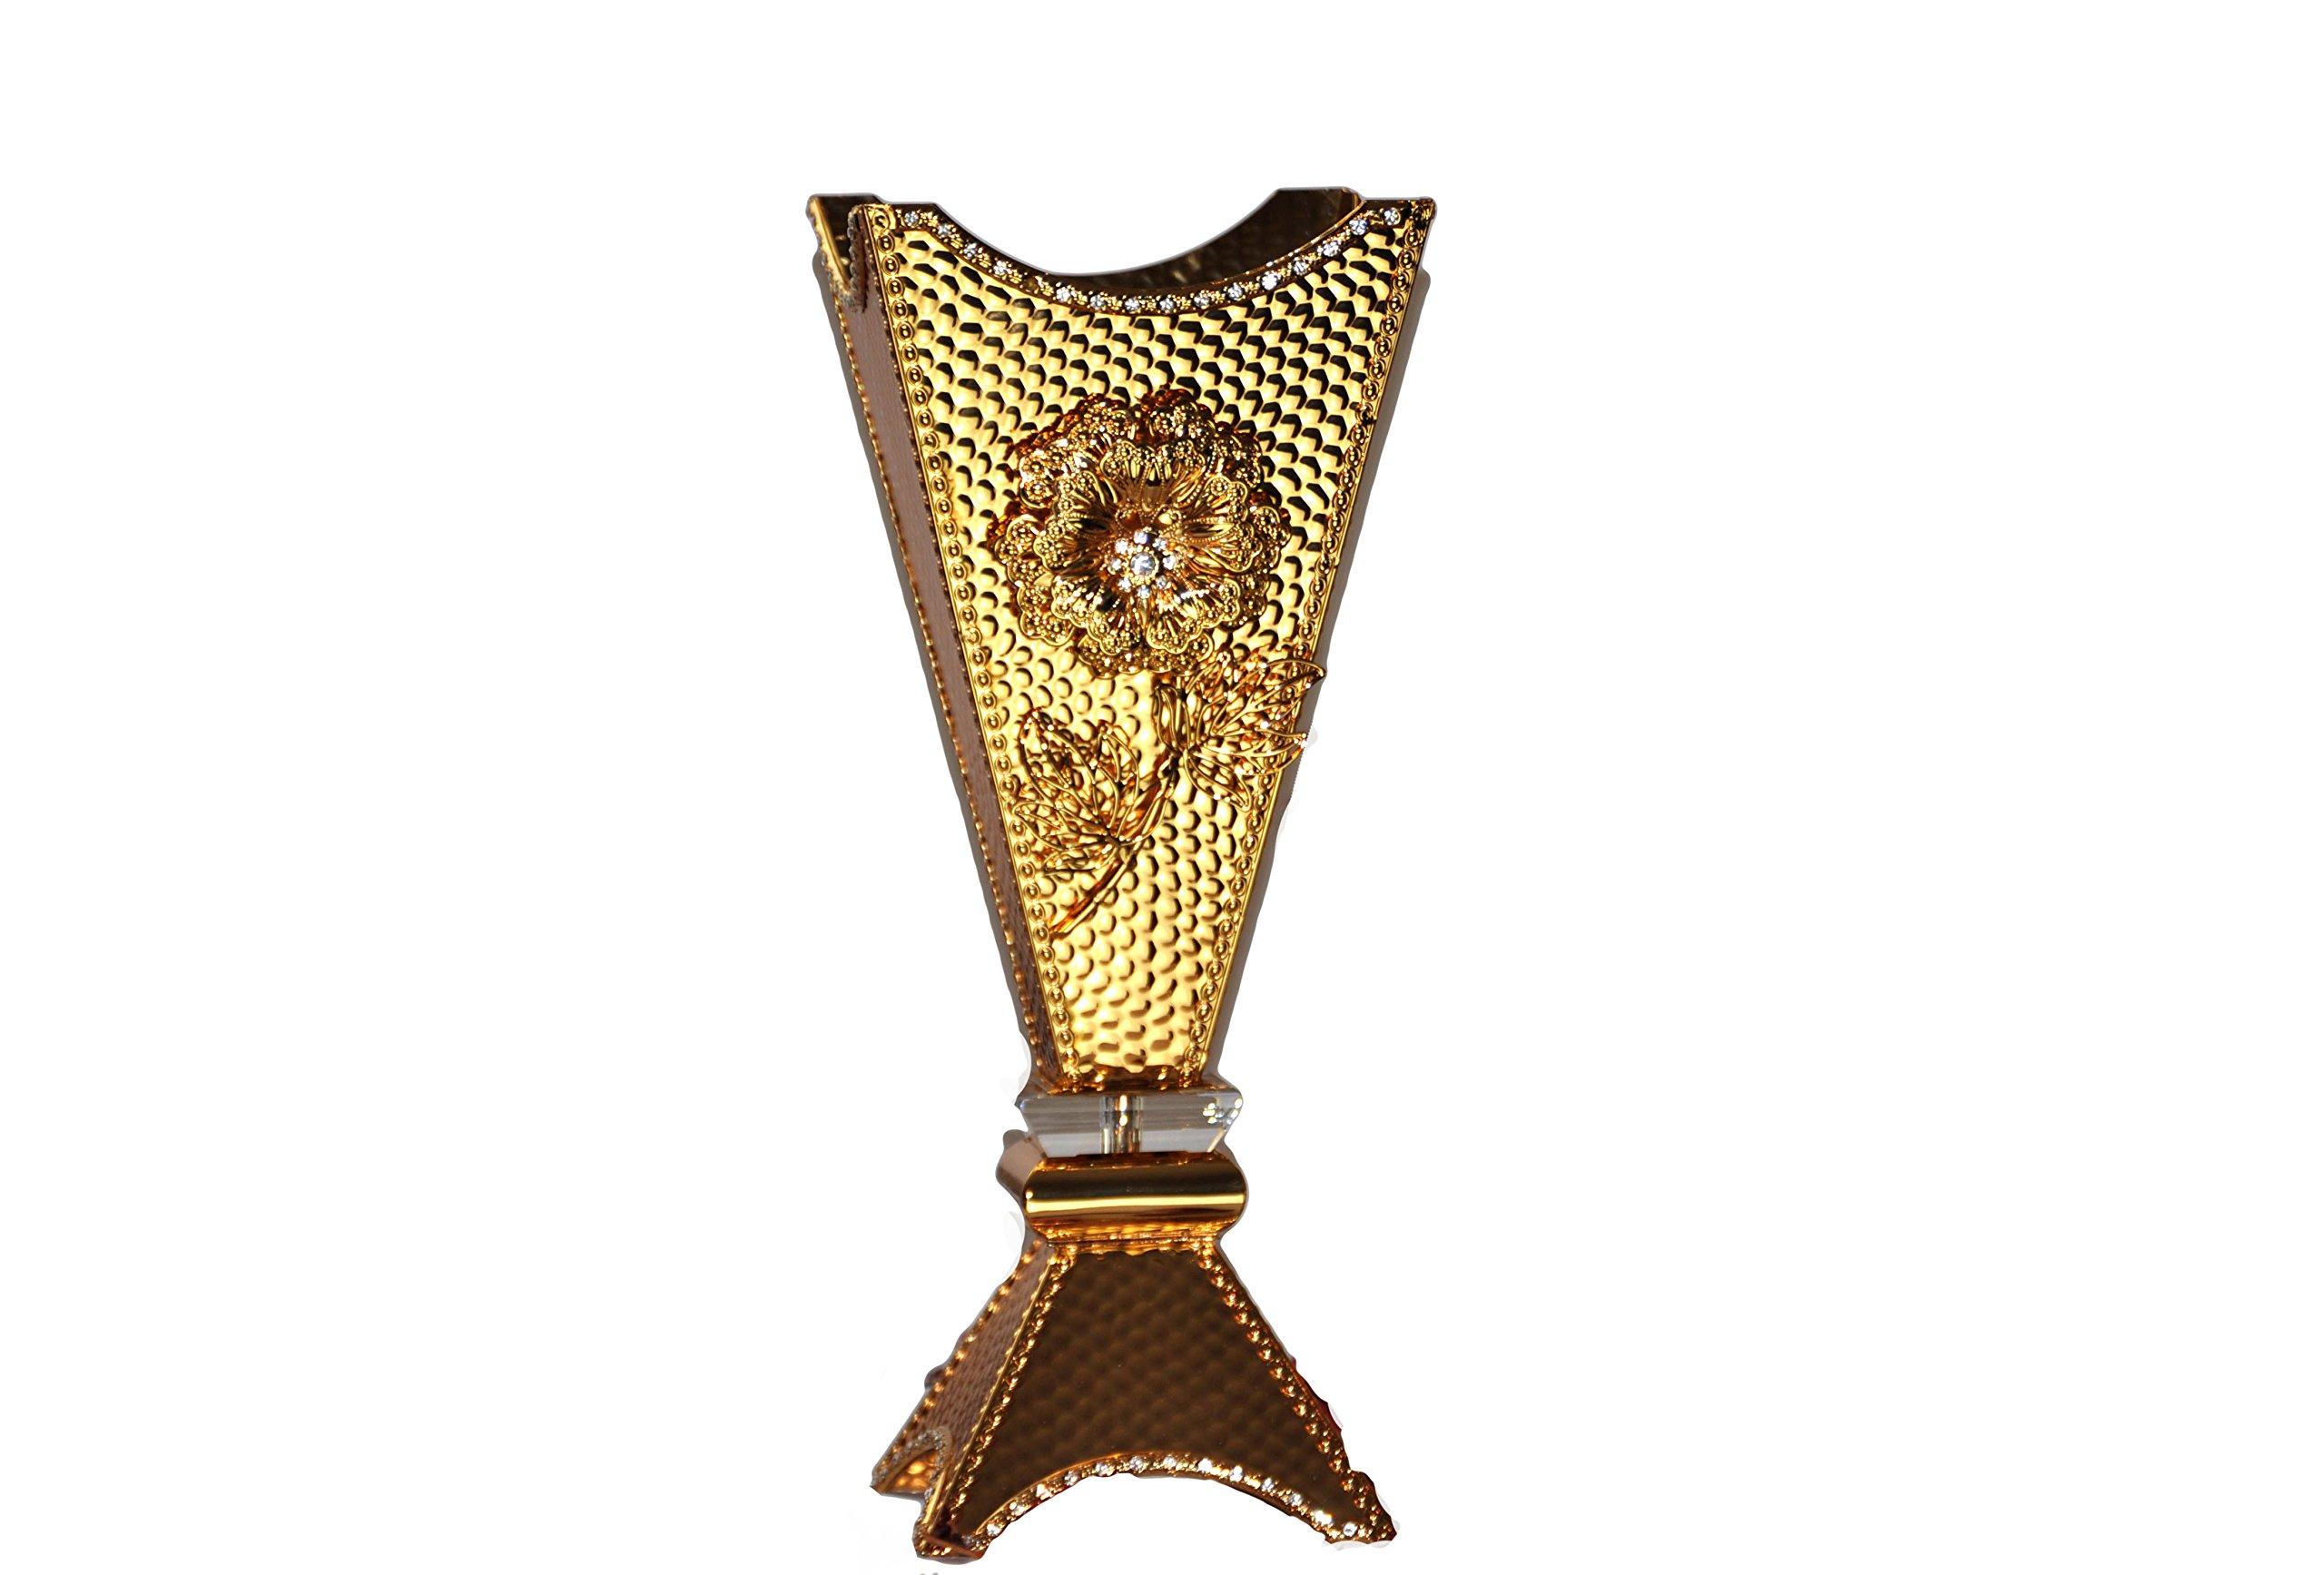 Arabia Incense/Bakhoor Burner (Mabkhara) -Oud Burner, Metal,Tray Inside 14 inch tall (Golden)